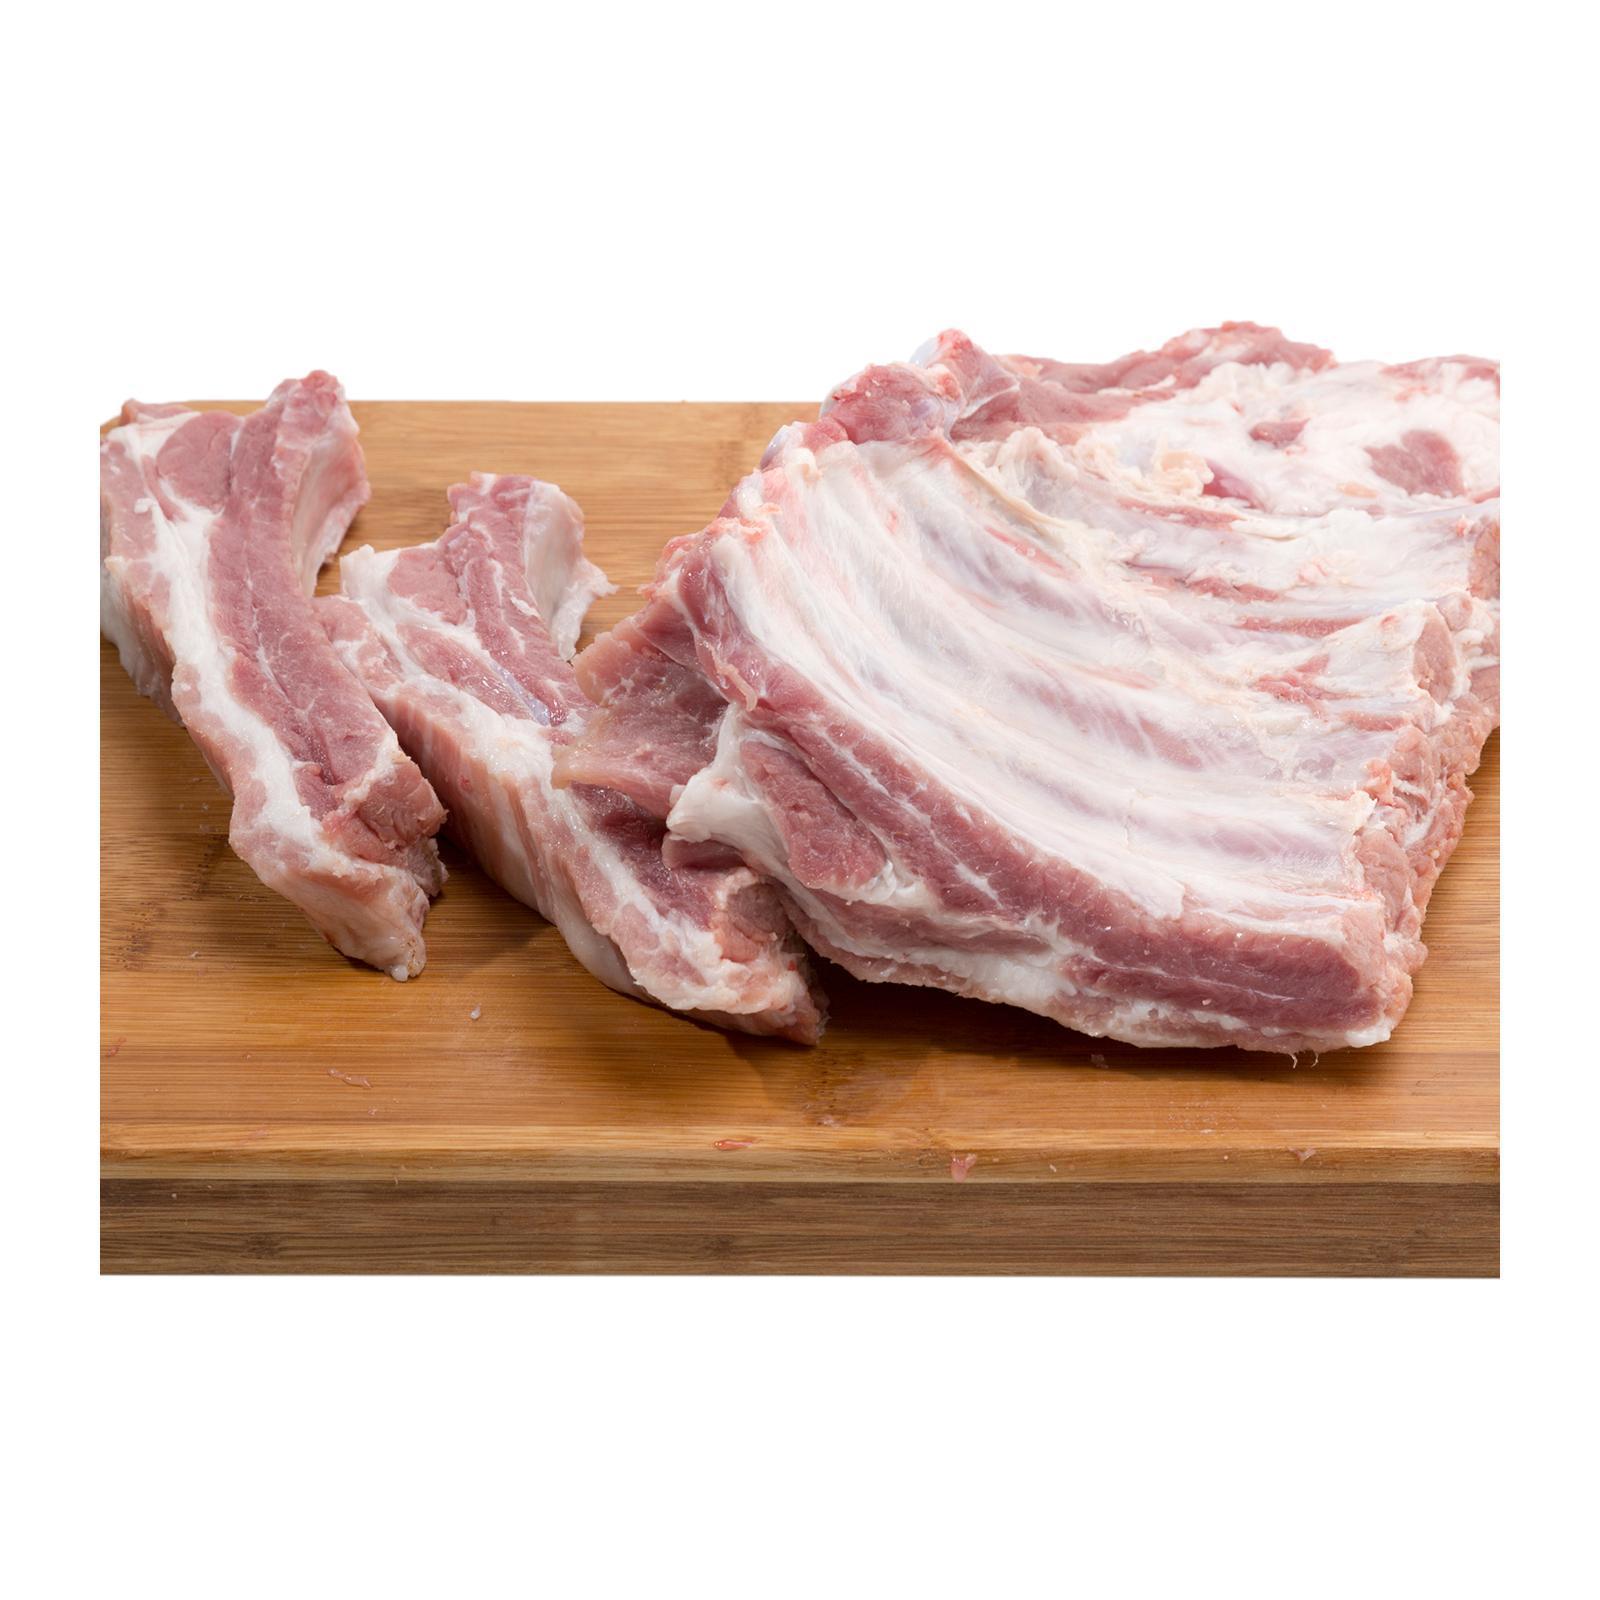 AW'S Market Indonesian Pork Small Ribs